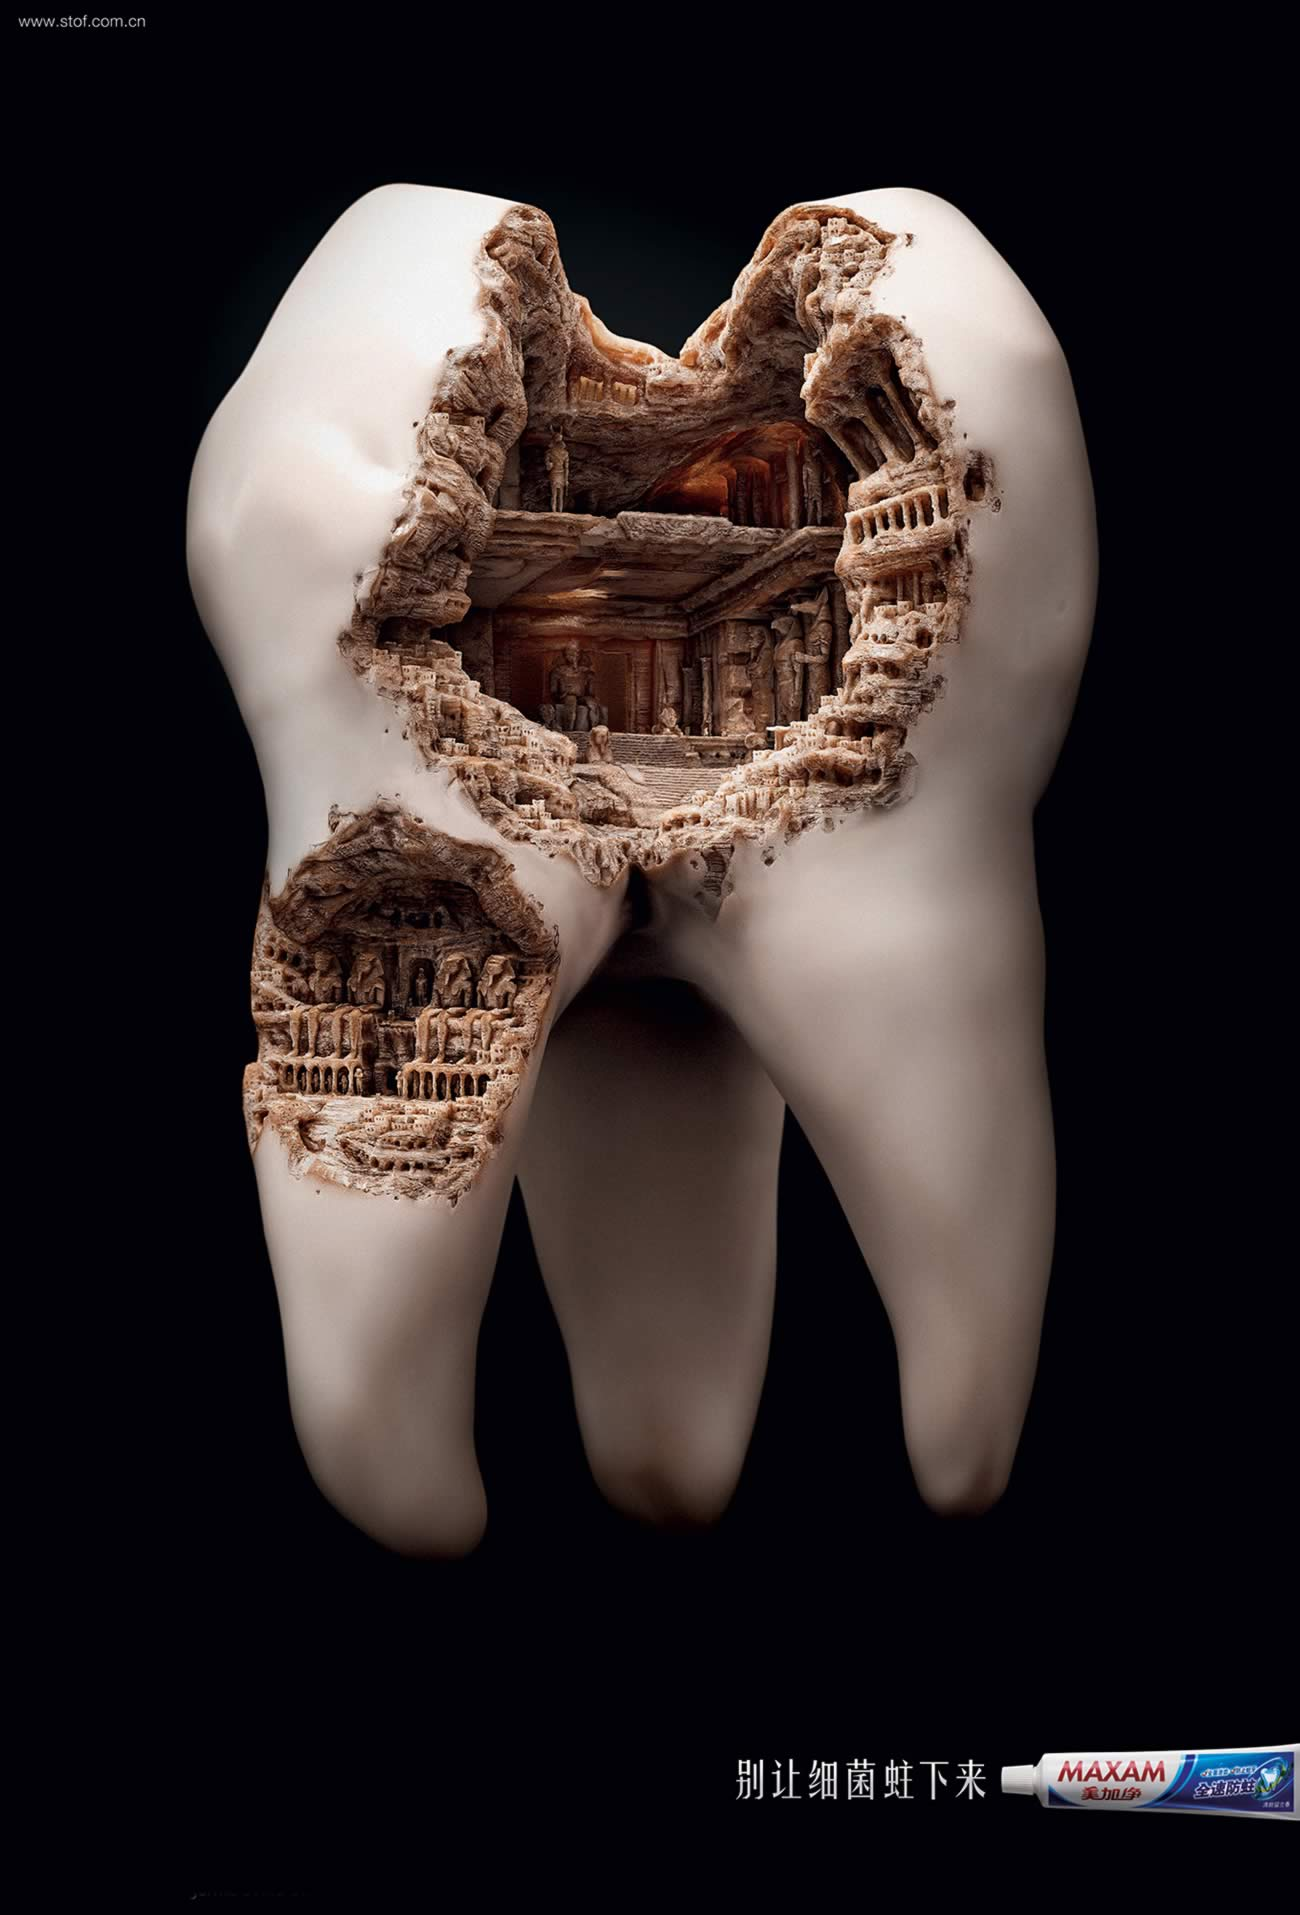 Maxam: Civilization, Egypt, print ad